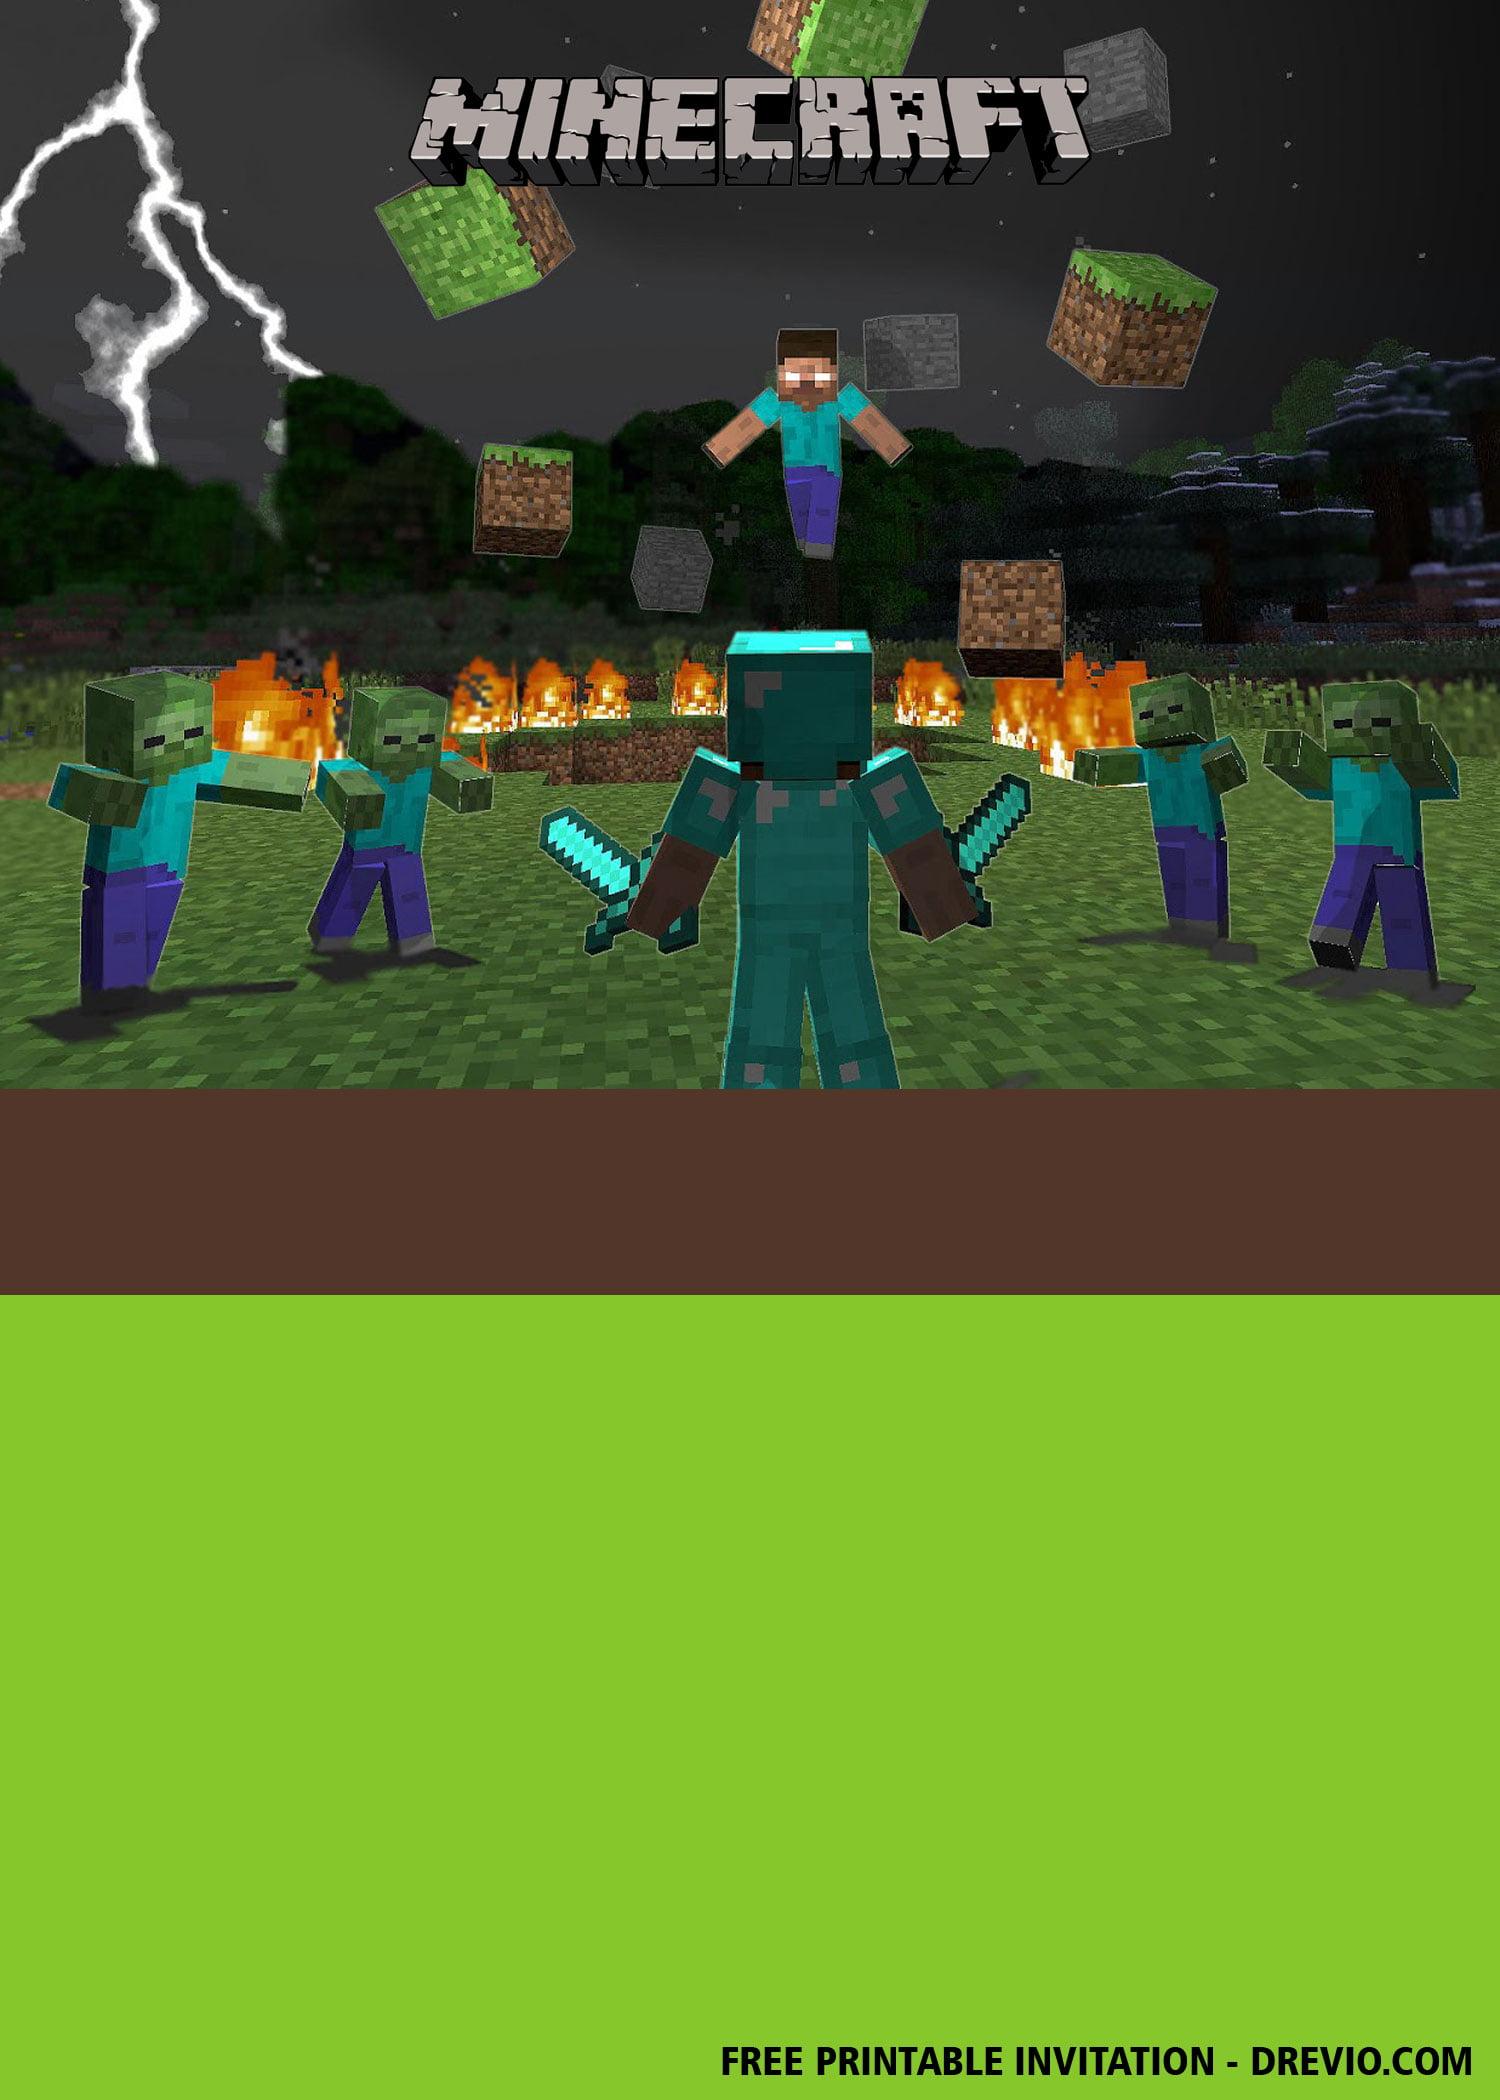 Free Printable Minecraft Invitation Templates